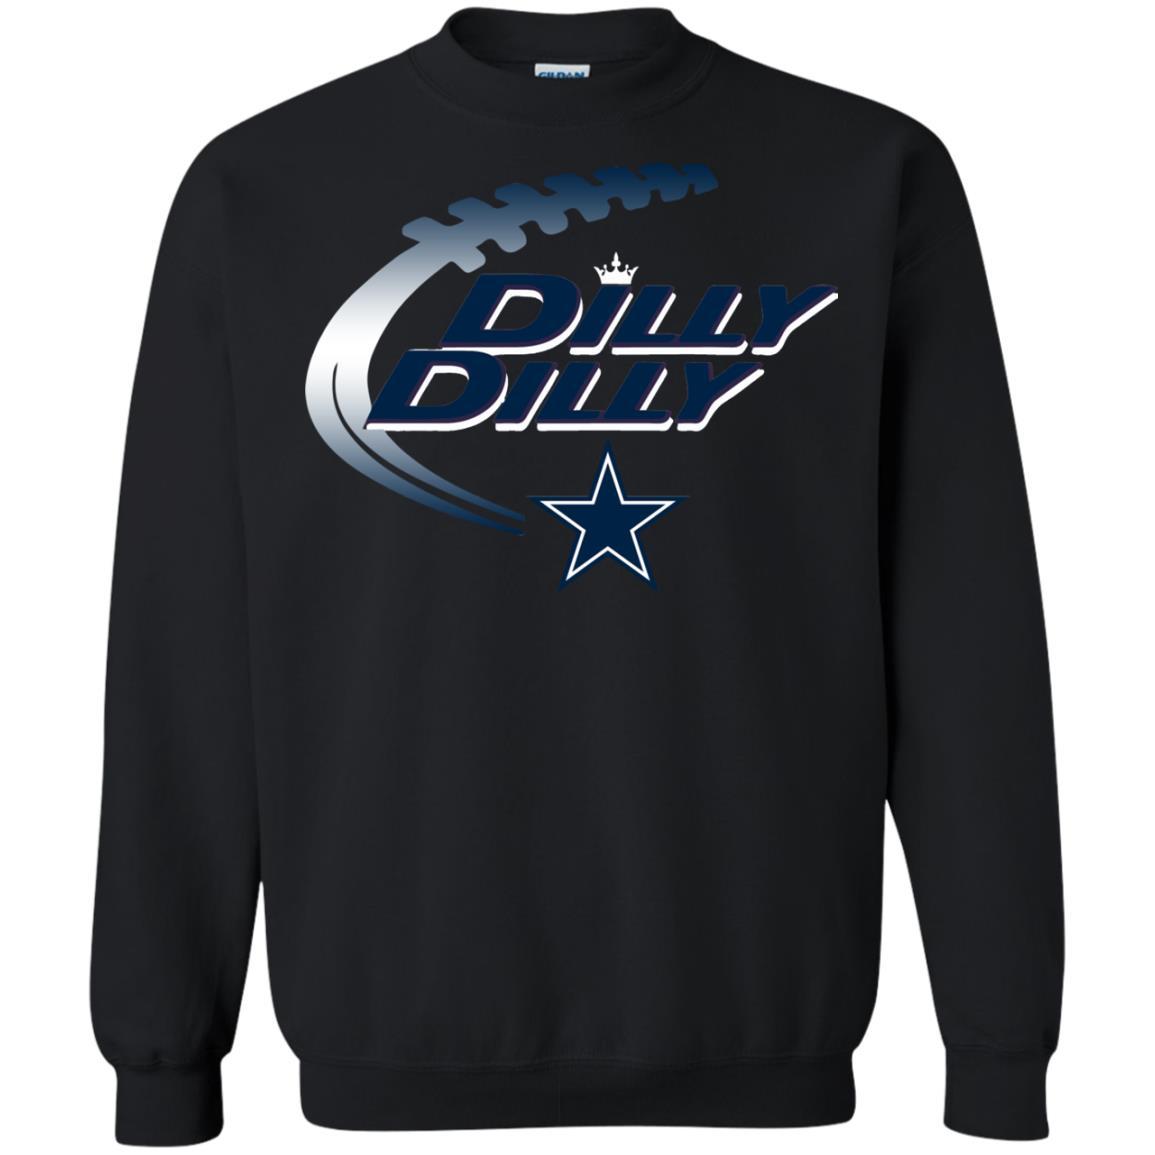 image 1680 - Dilly Dilly Dallas Cowboys Shirt & Sweatshirts